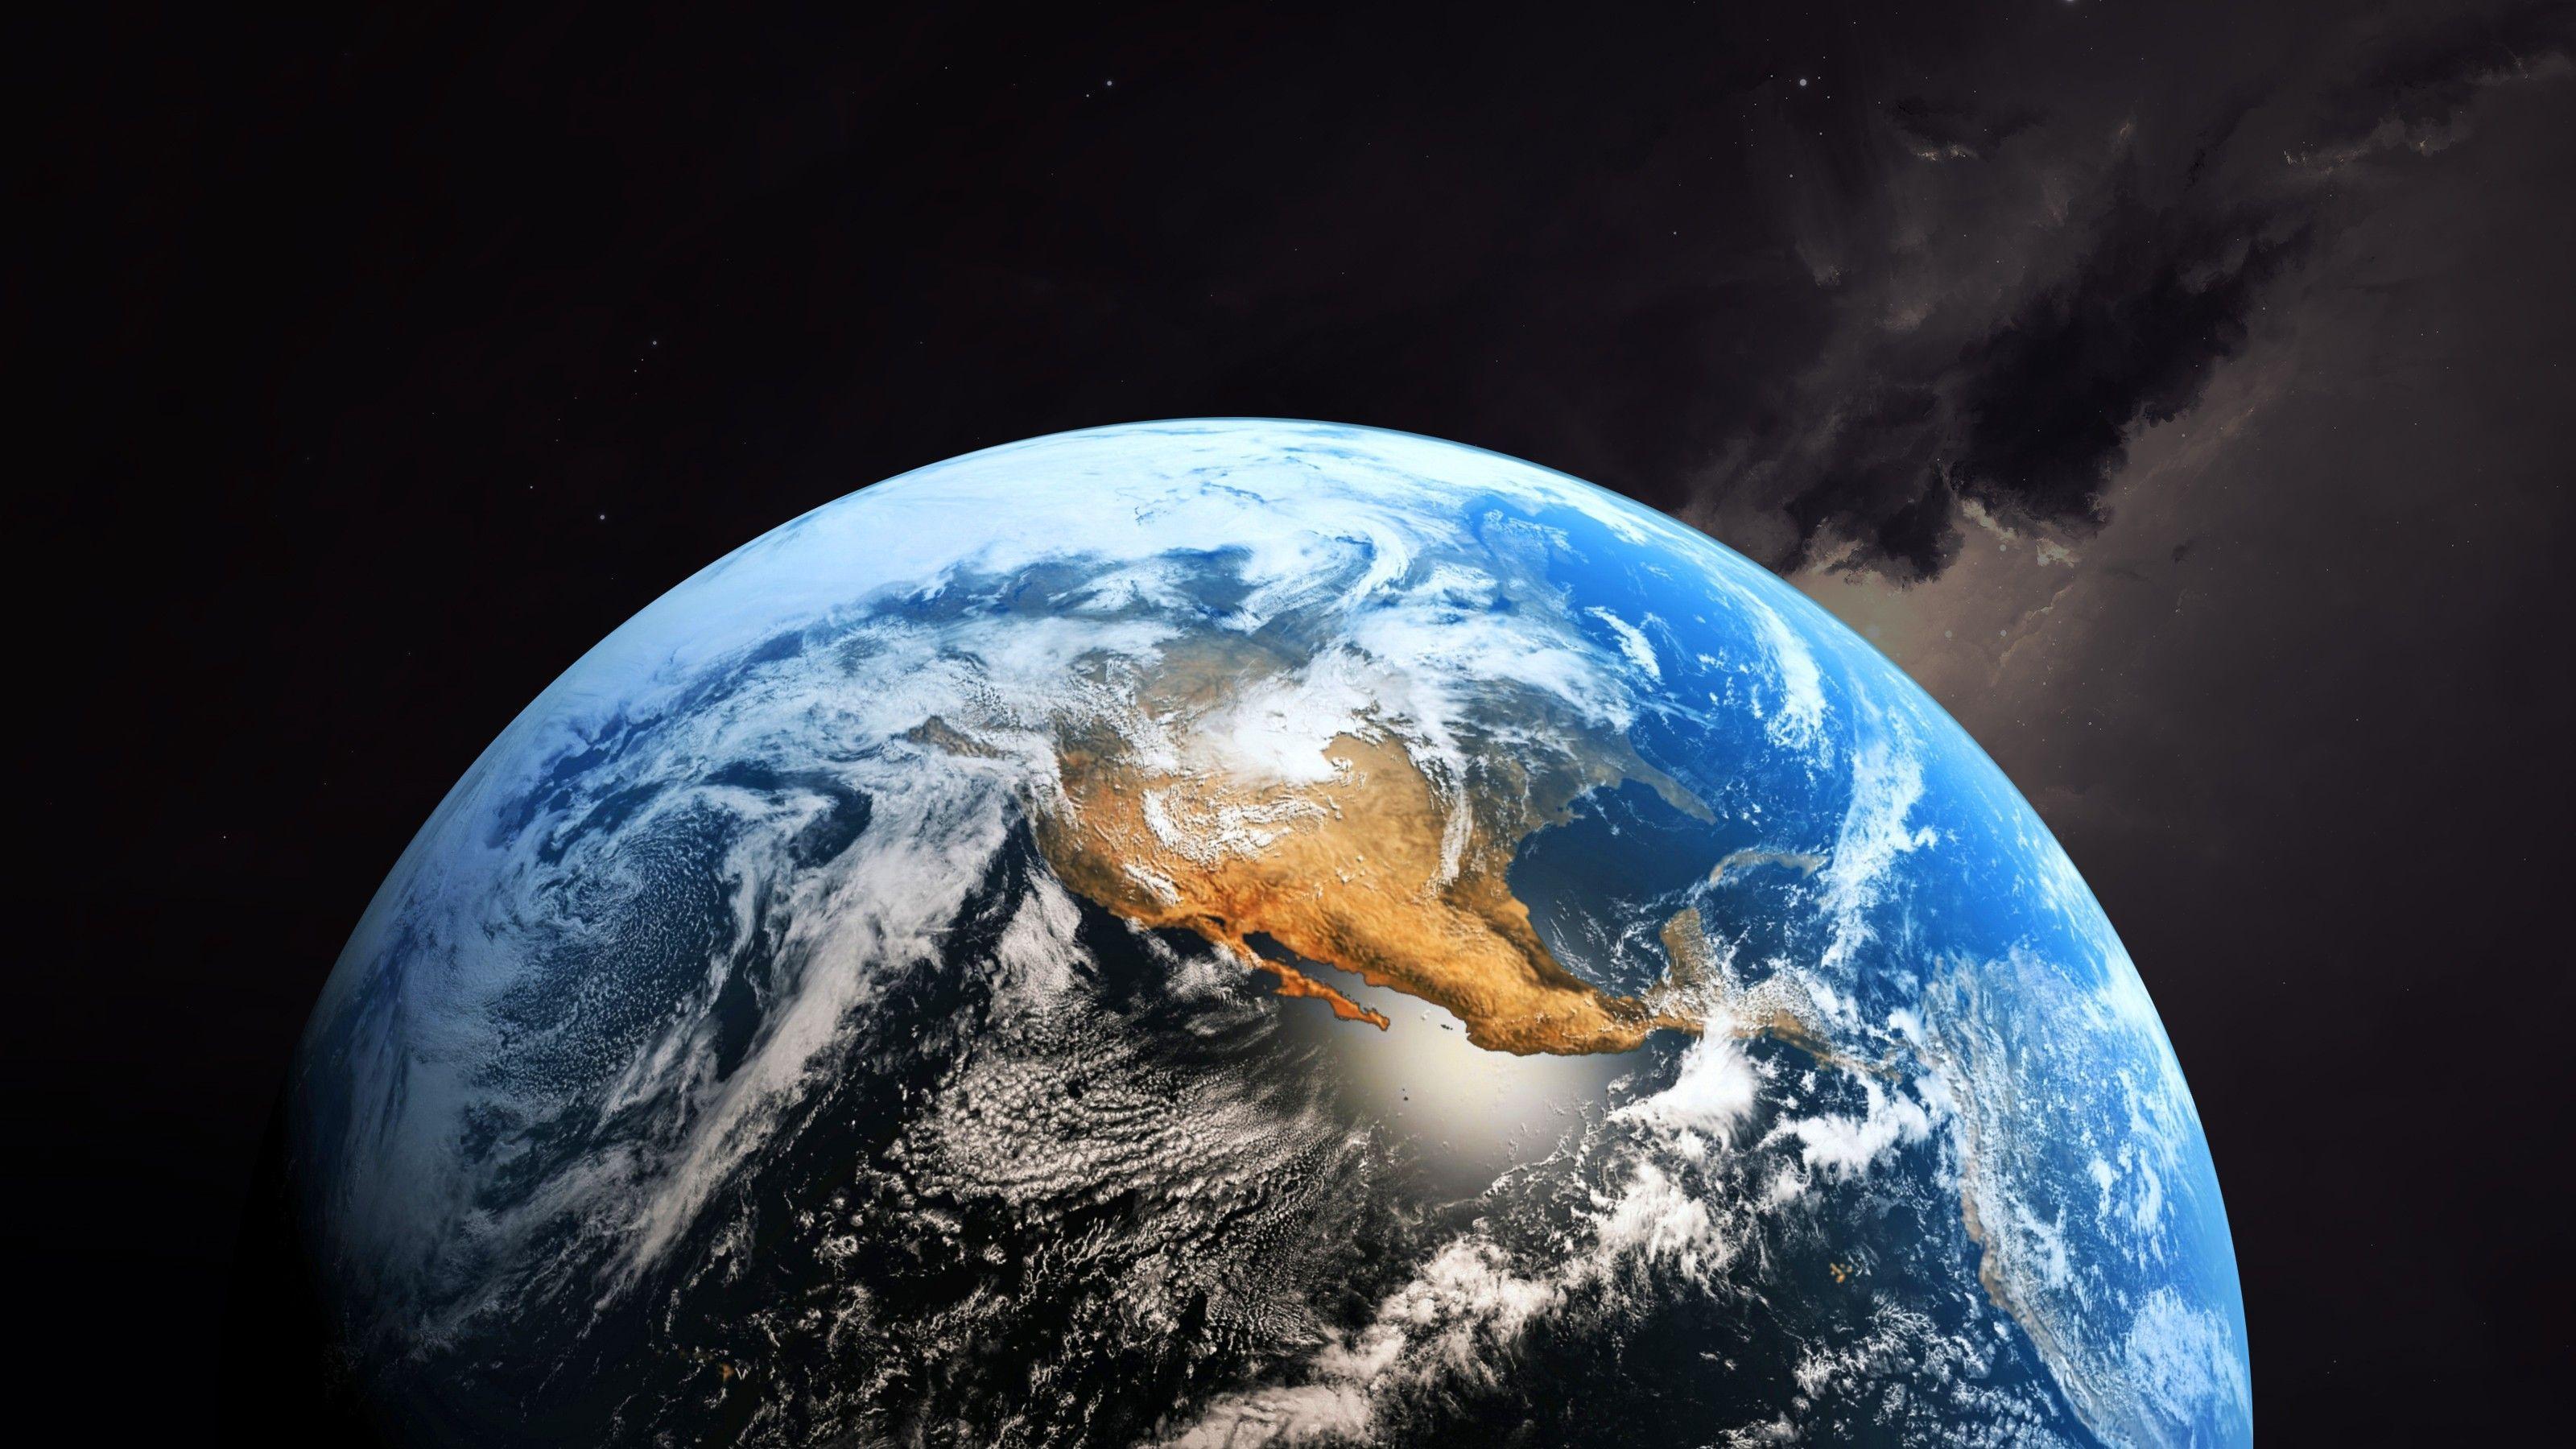 World Globe Wallpapers Top Free World Globe Backgrounds Wallpaperaccess